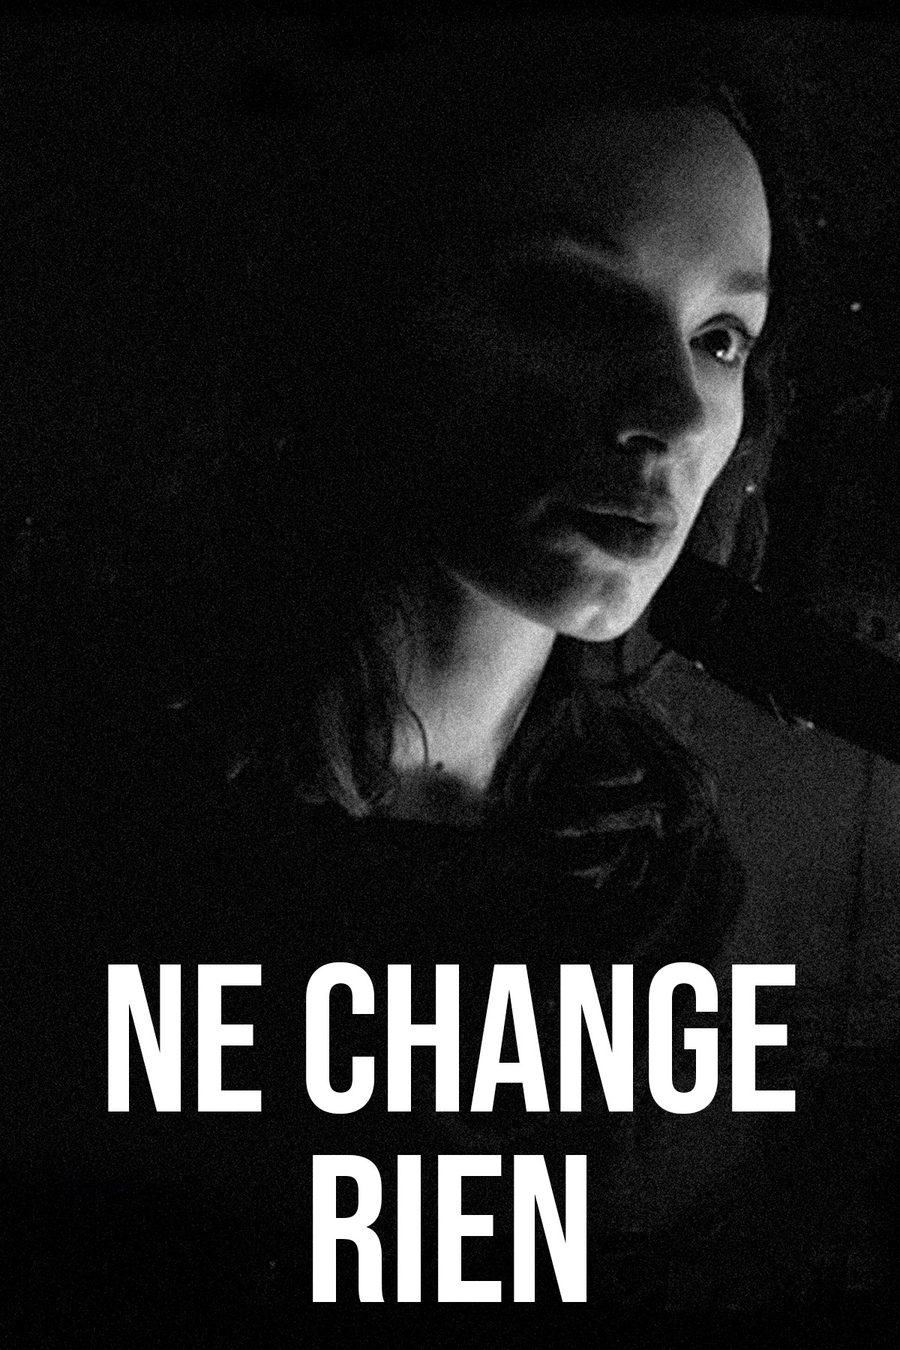 Ne change rien